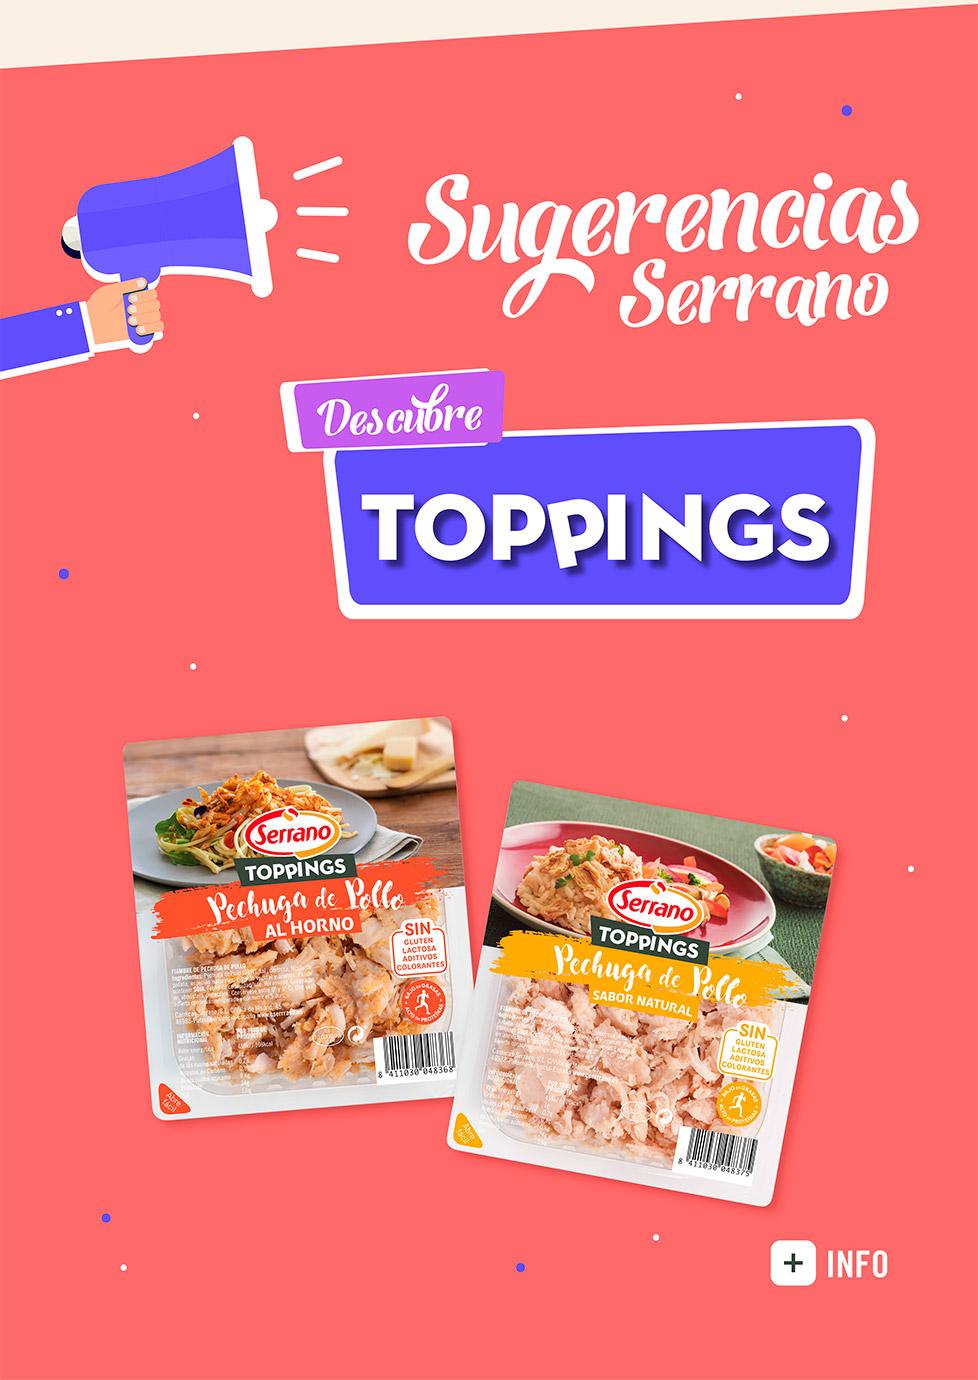 Toppings Serrano